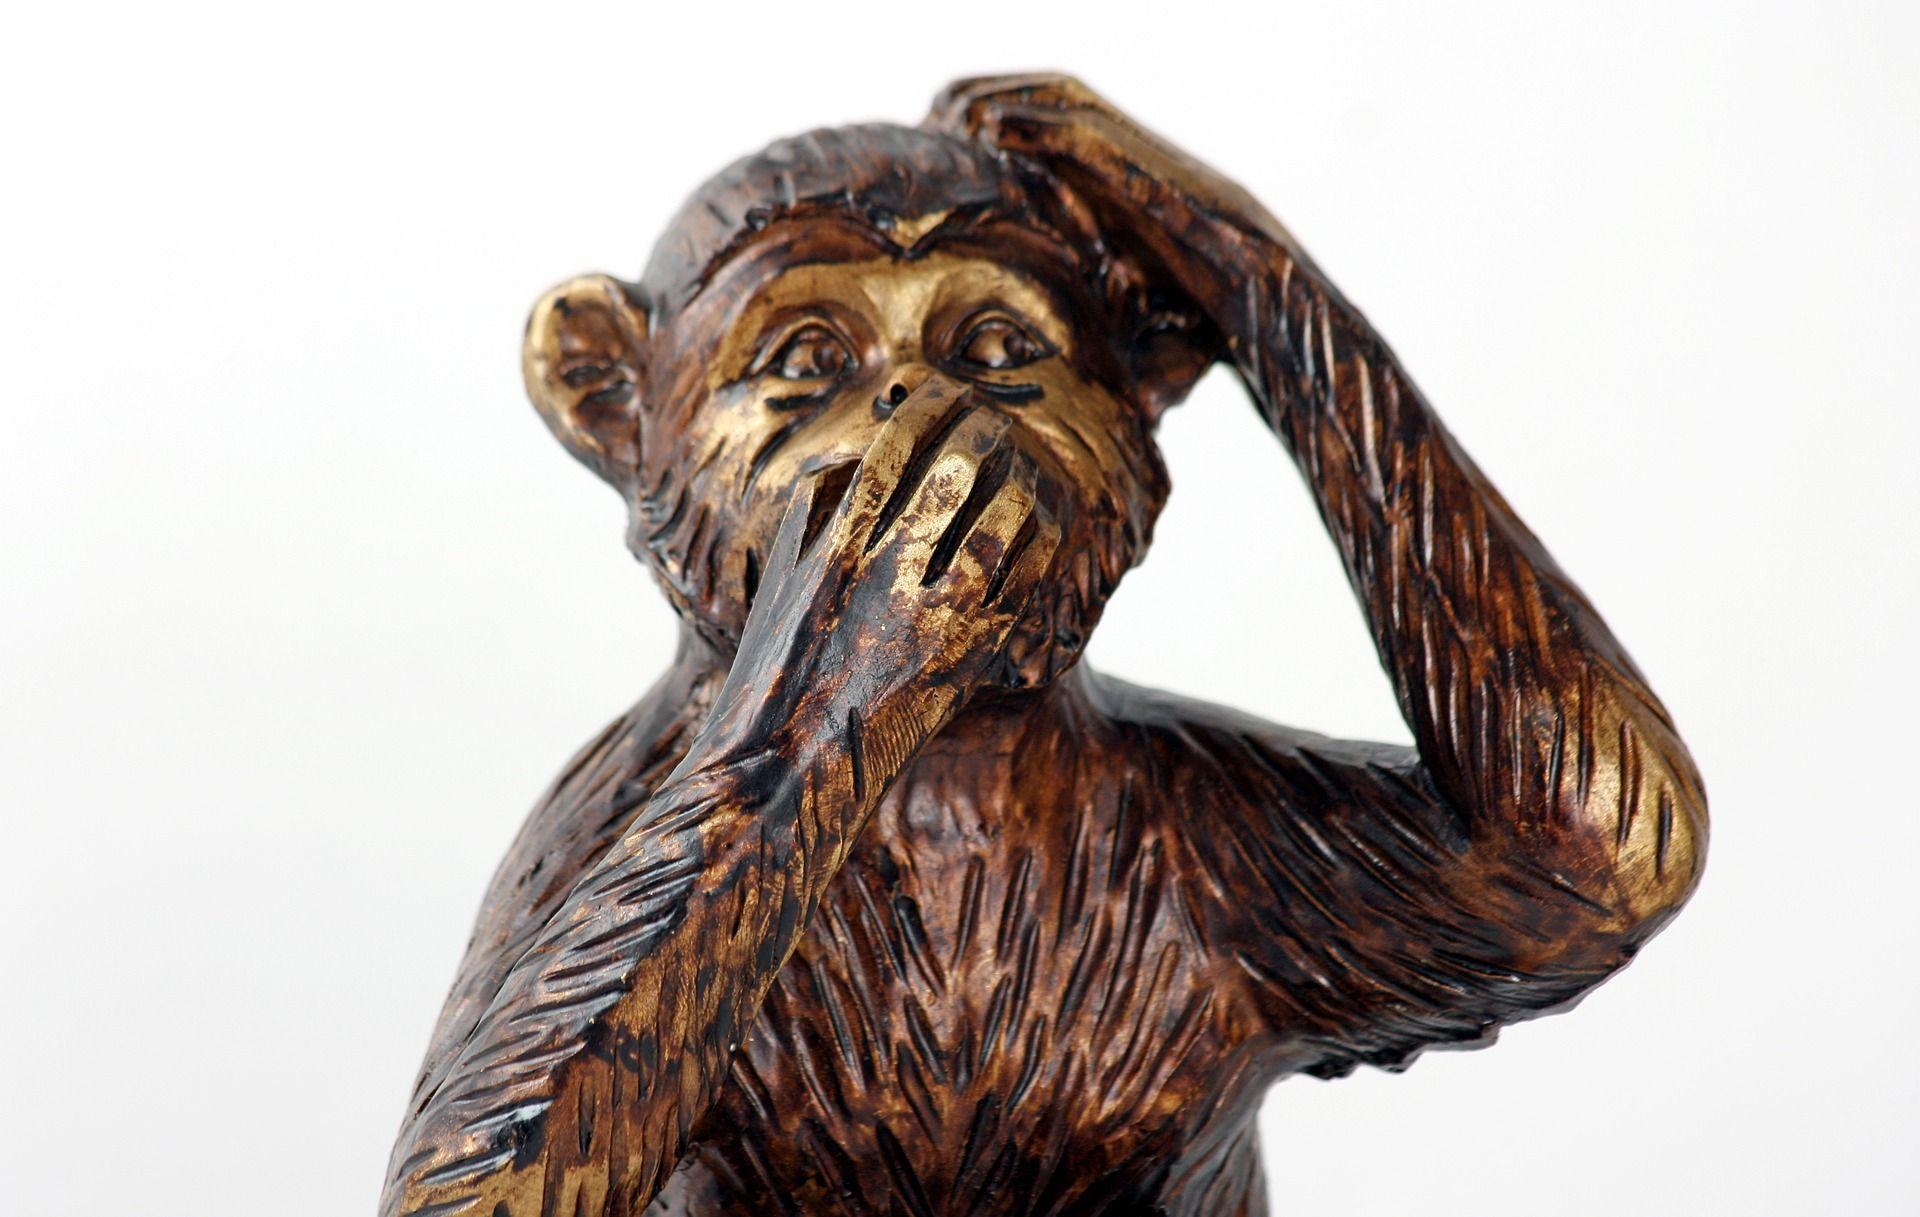 Chinese monkey for ear-eye training